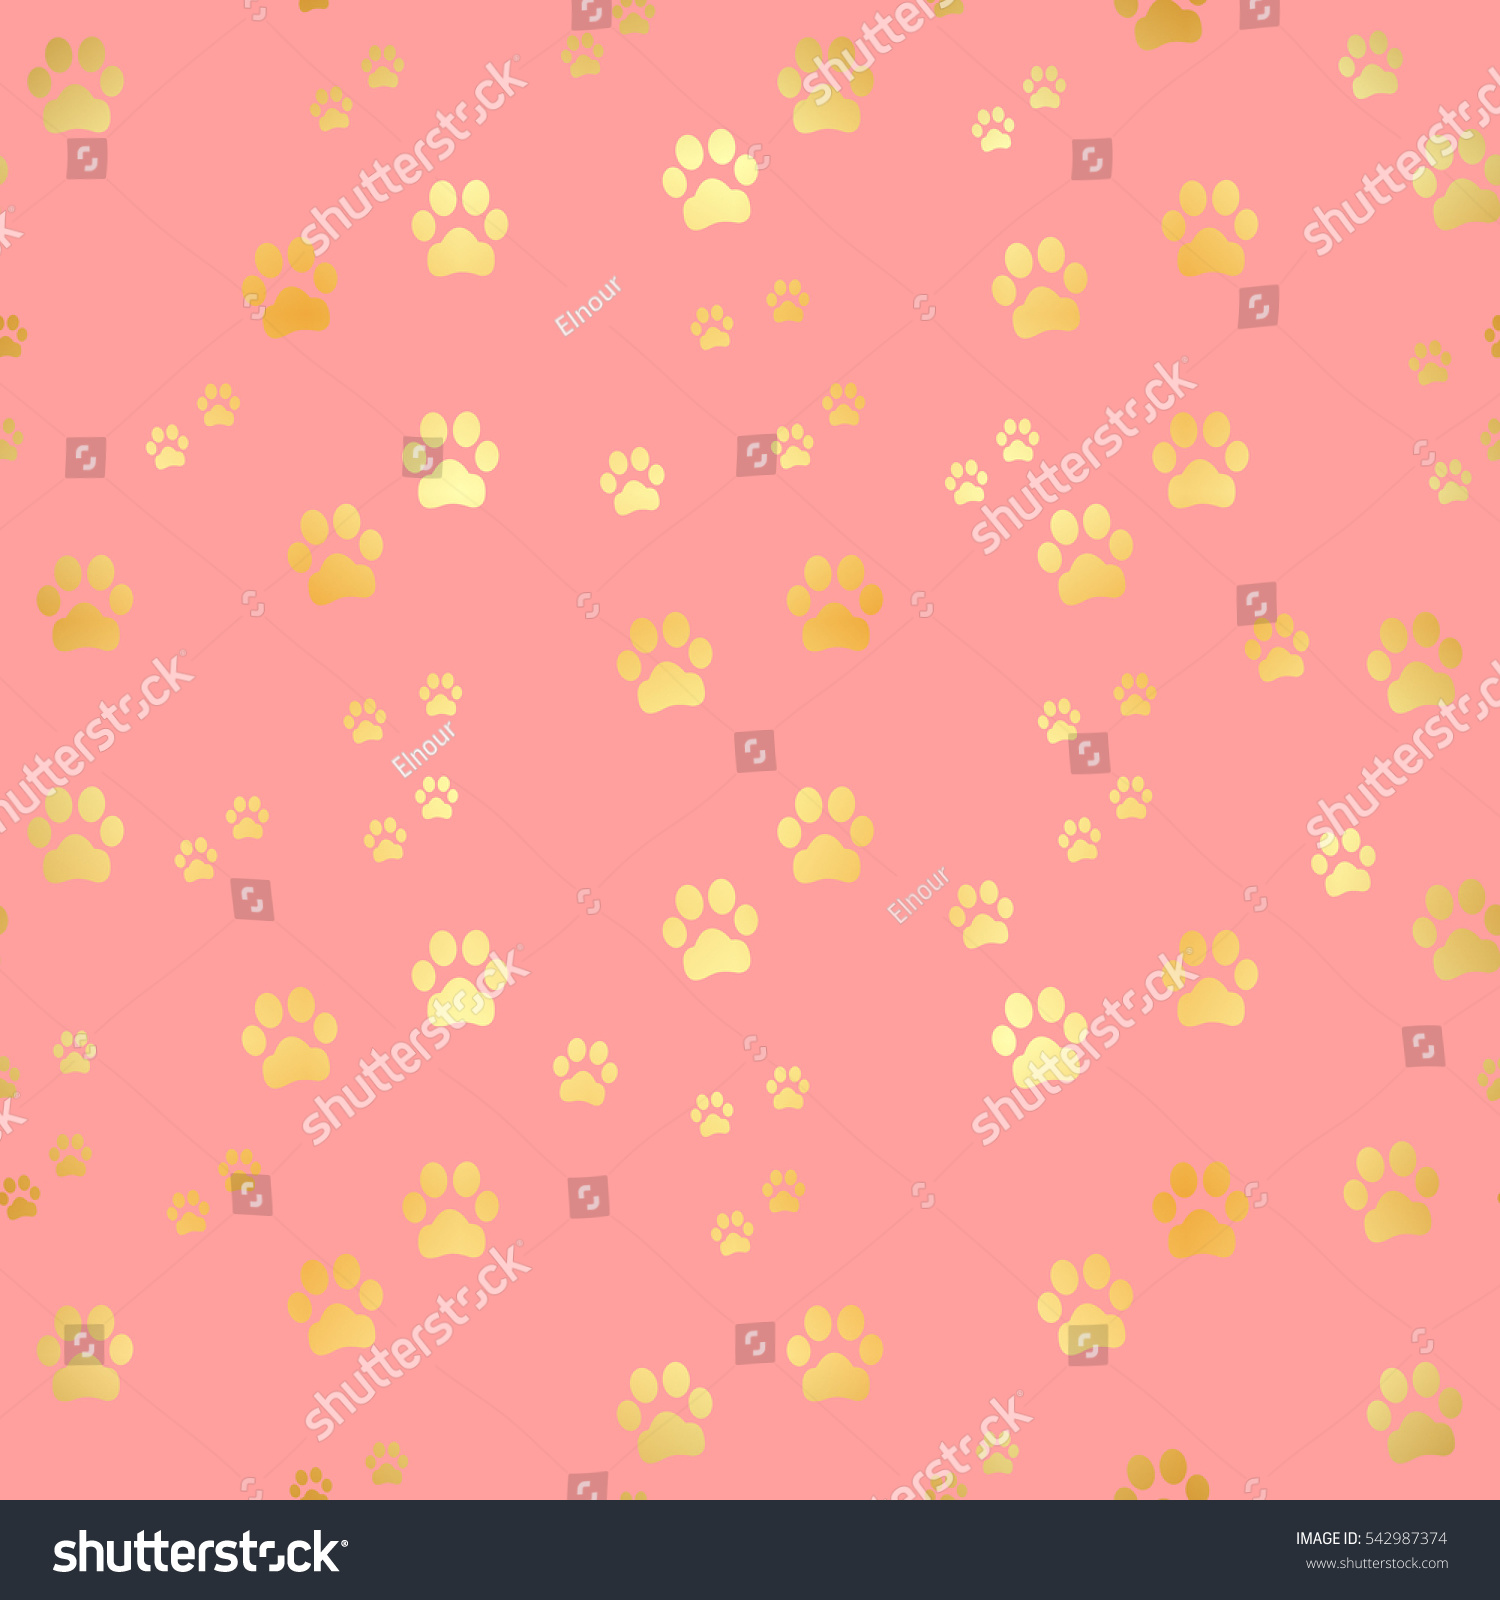 Gold Paw Print Seamless Pattern Stock Illustration Dog Trail Background